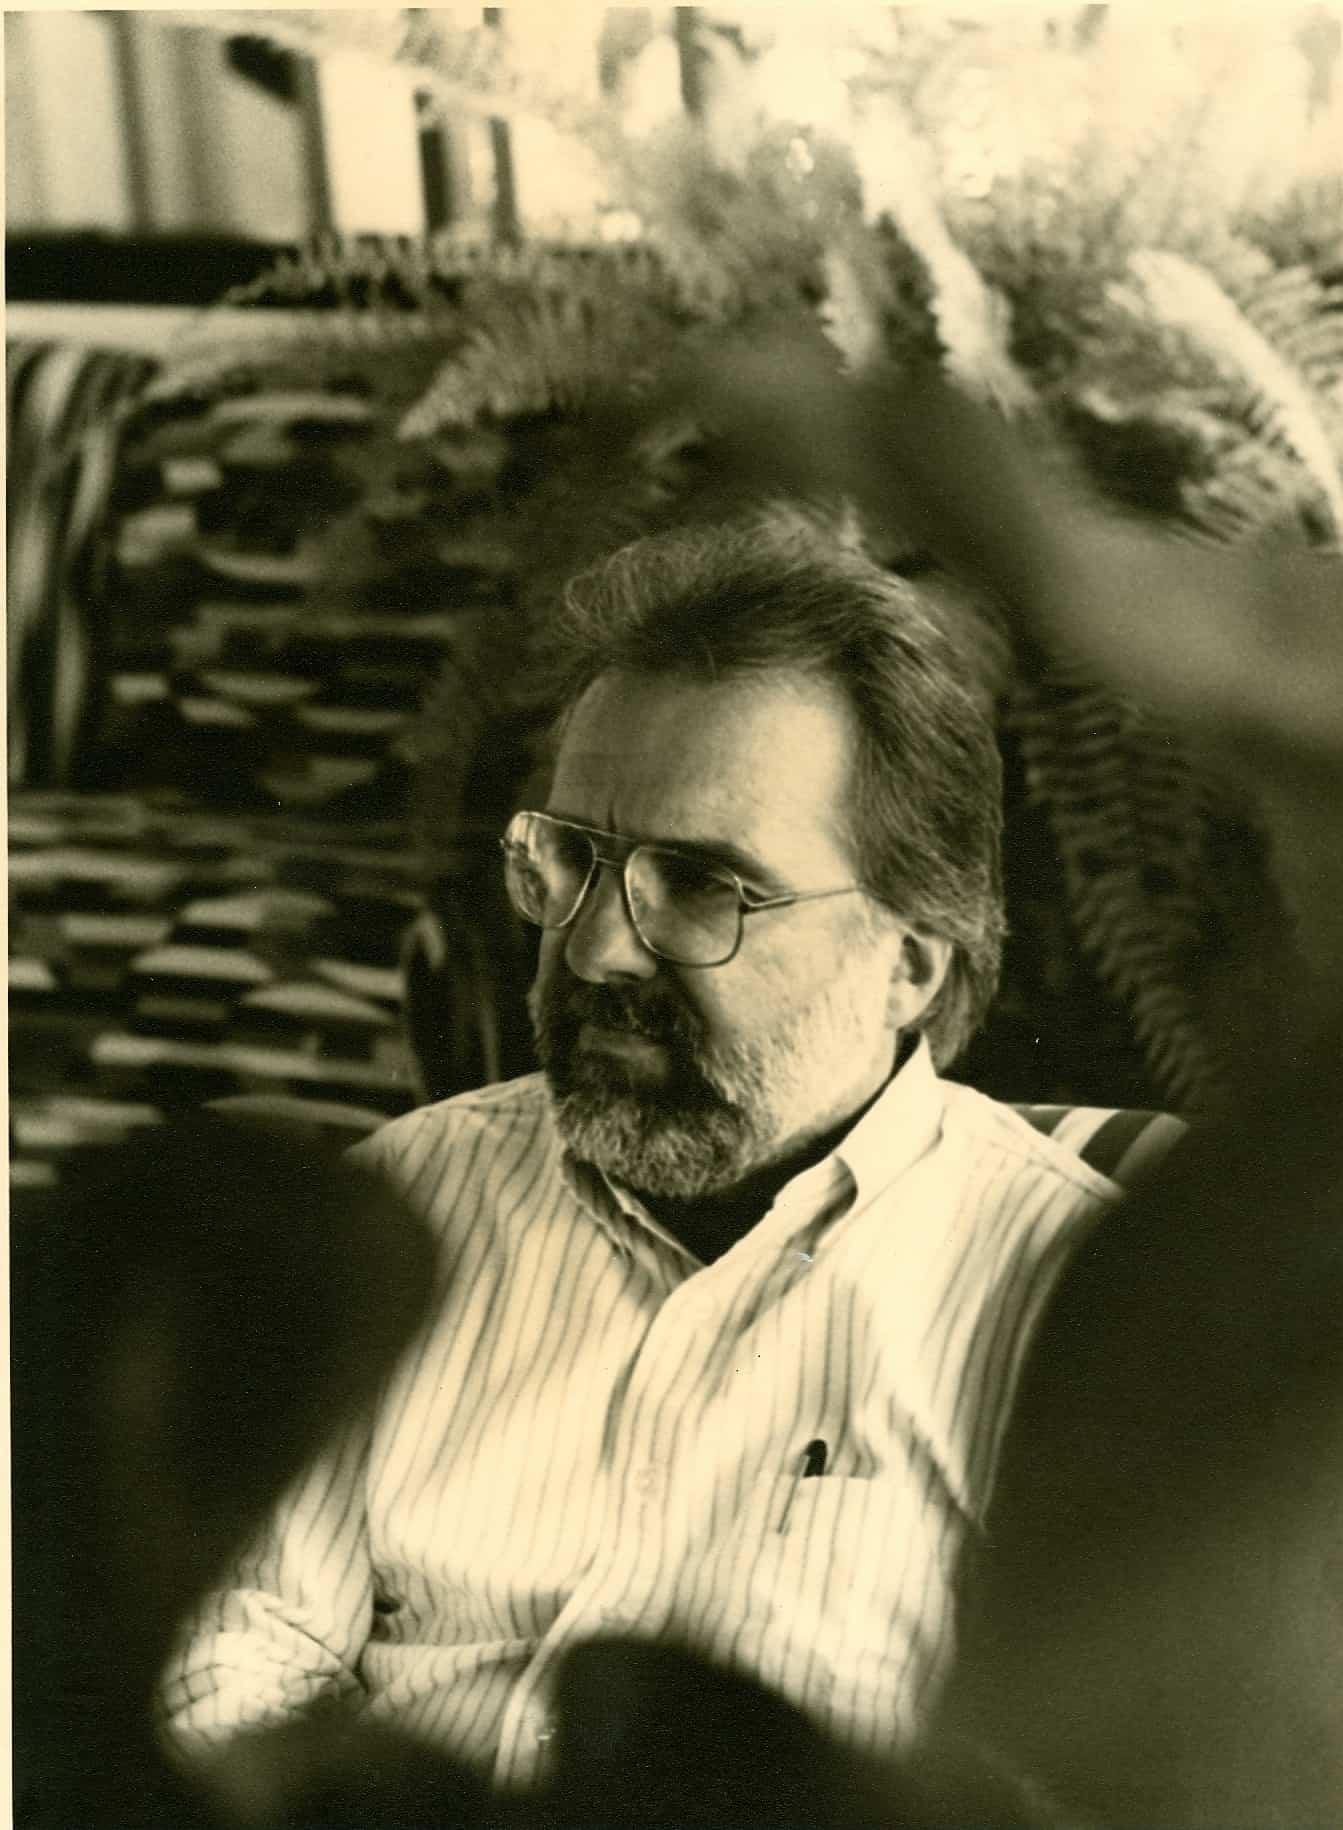 Jhon Hanhardt, 1987. Rassegna internazionale video d'autore. Taormina.